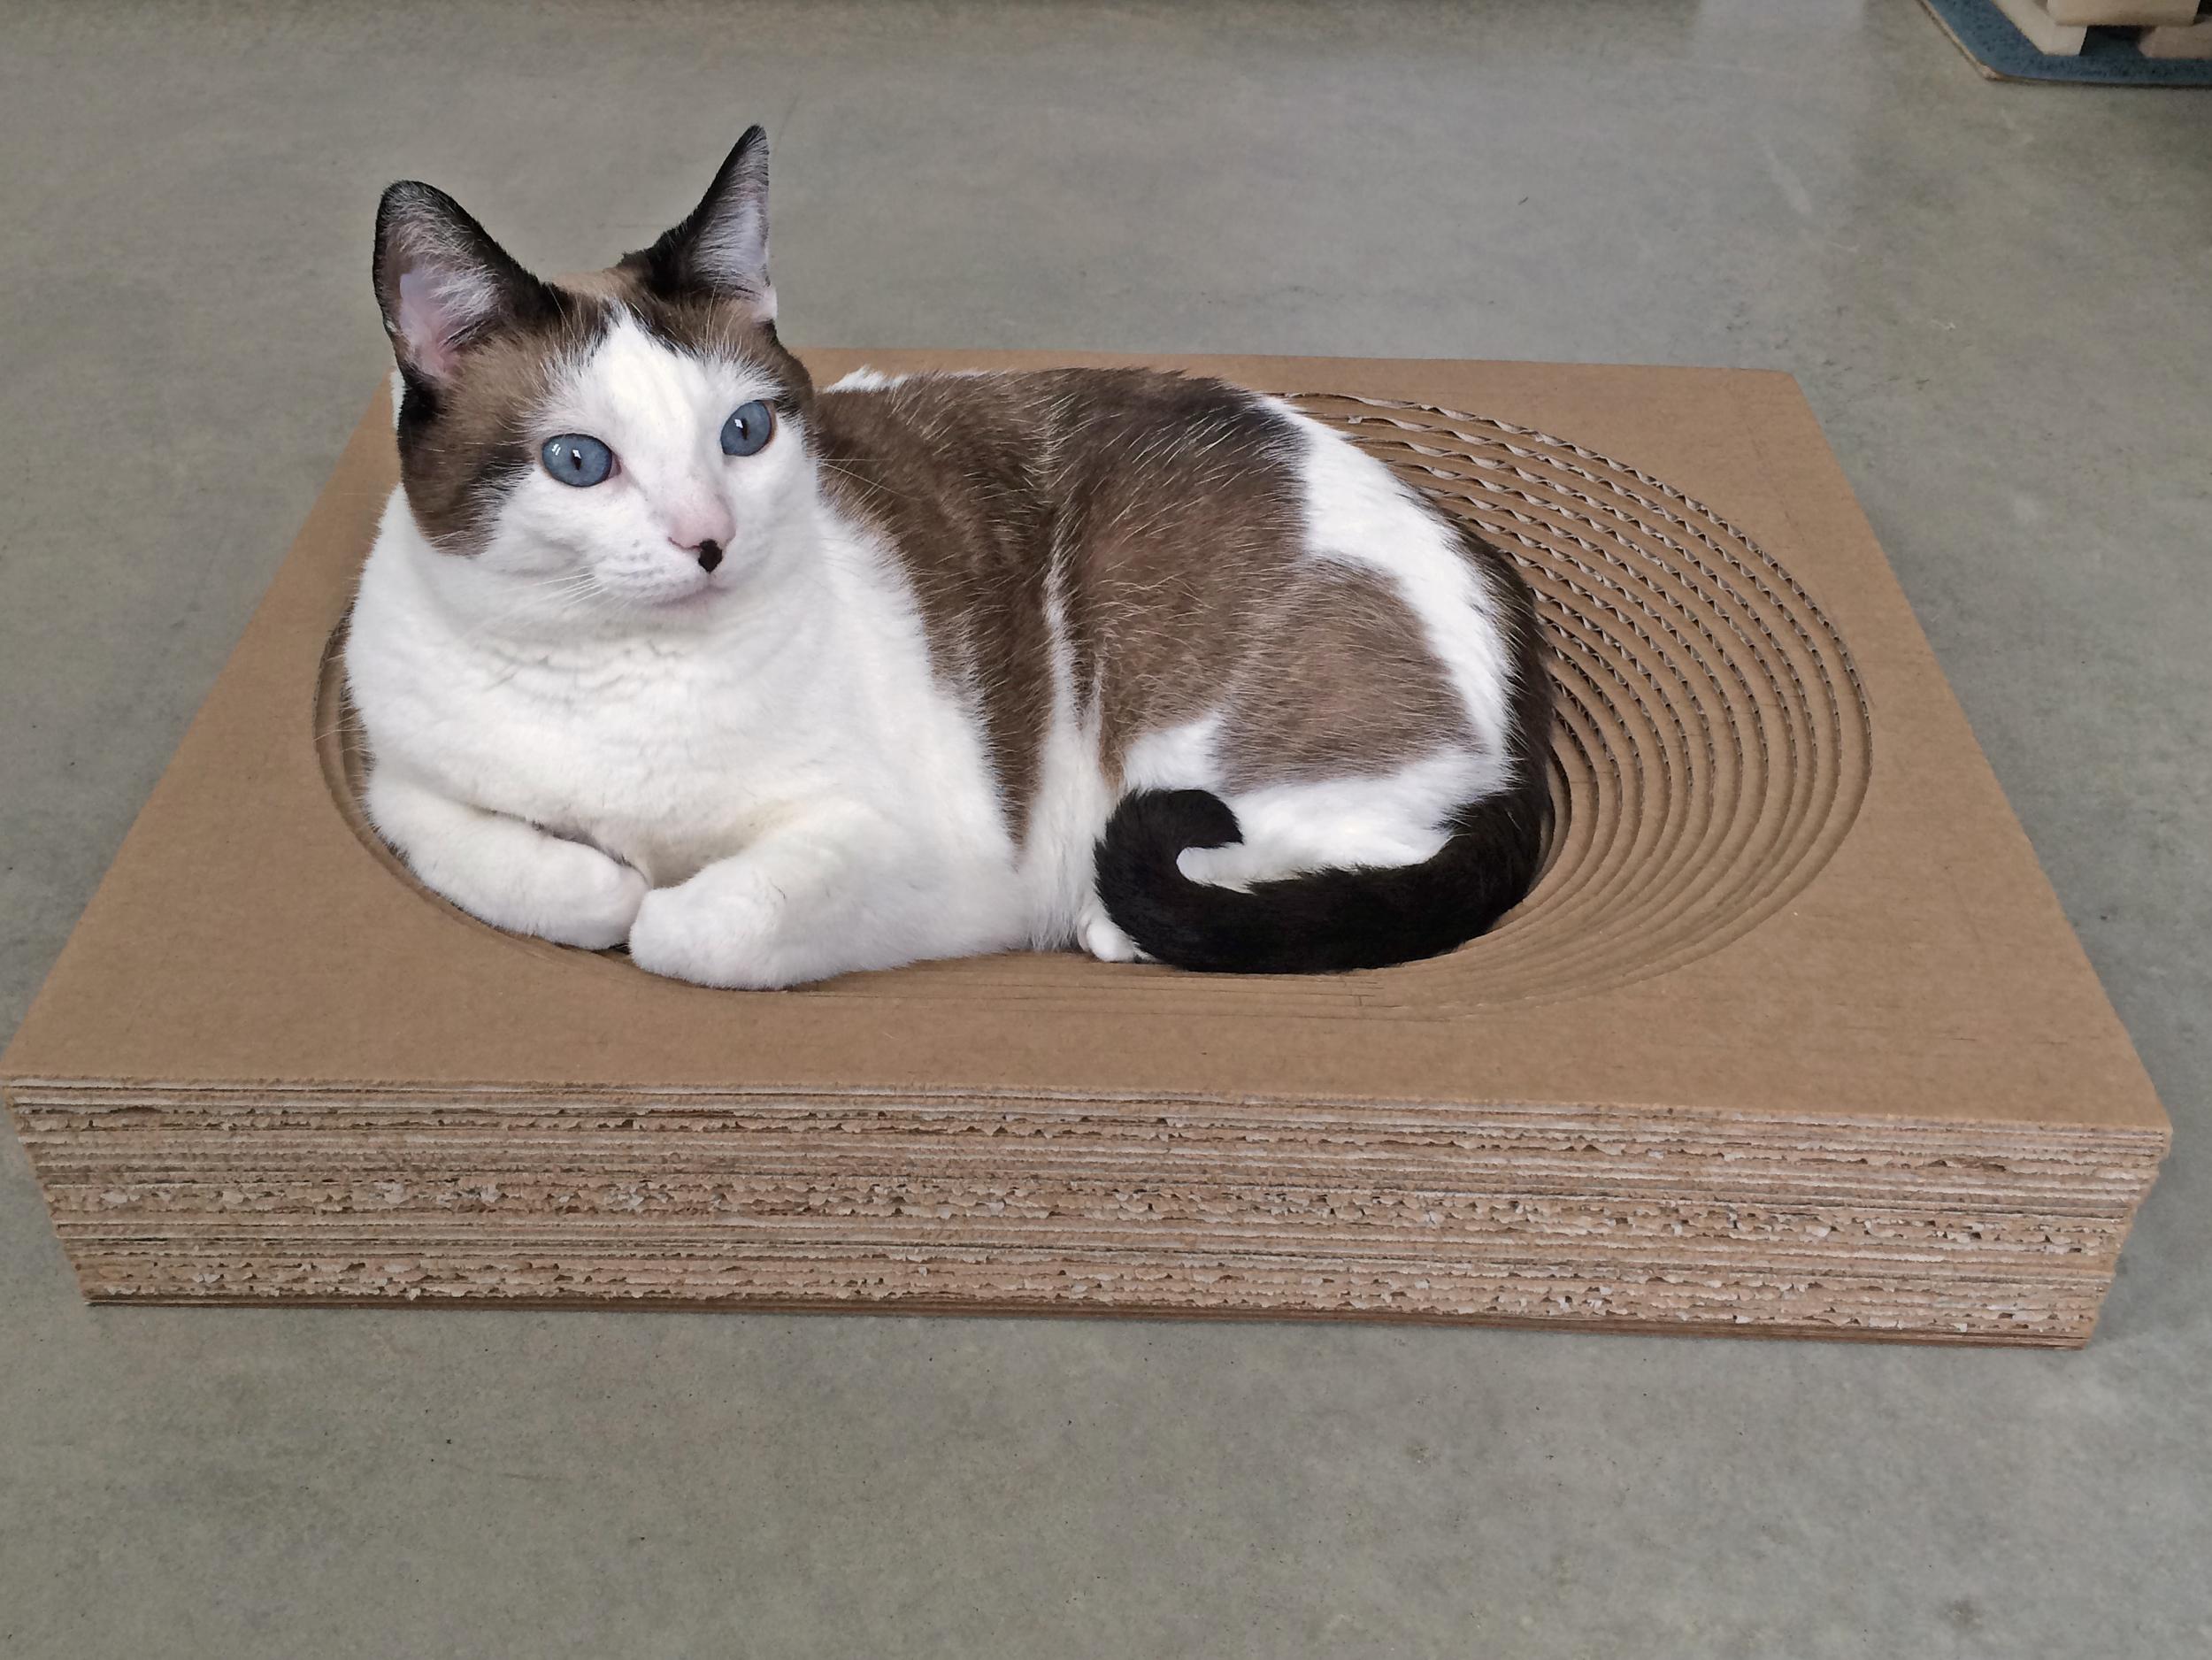 Modern Cardboard Cat Bed - Stadium Version